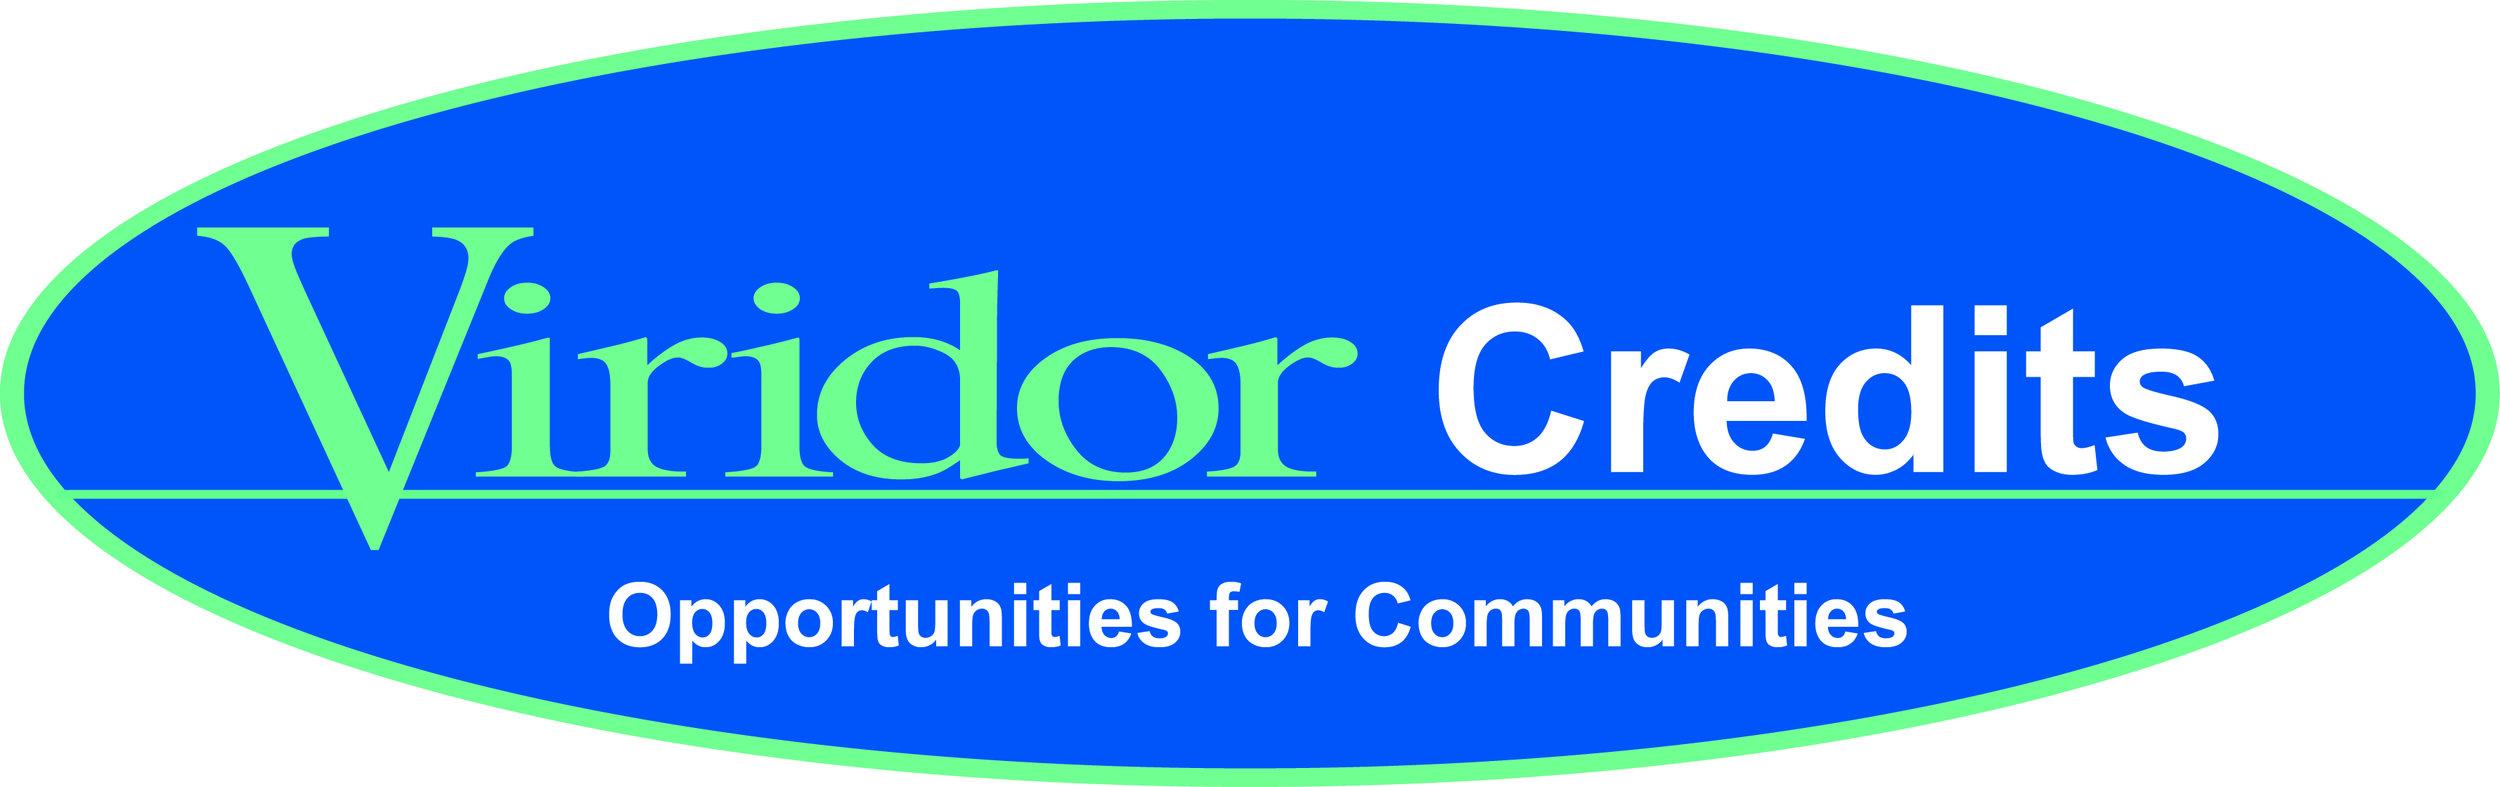 Logo Viridor Credits.jpg